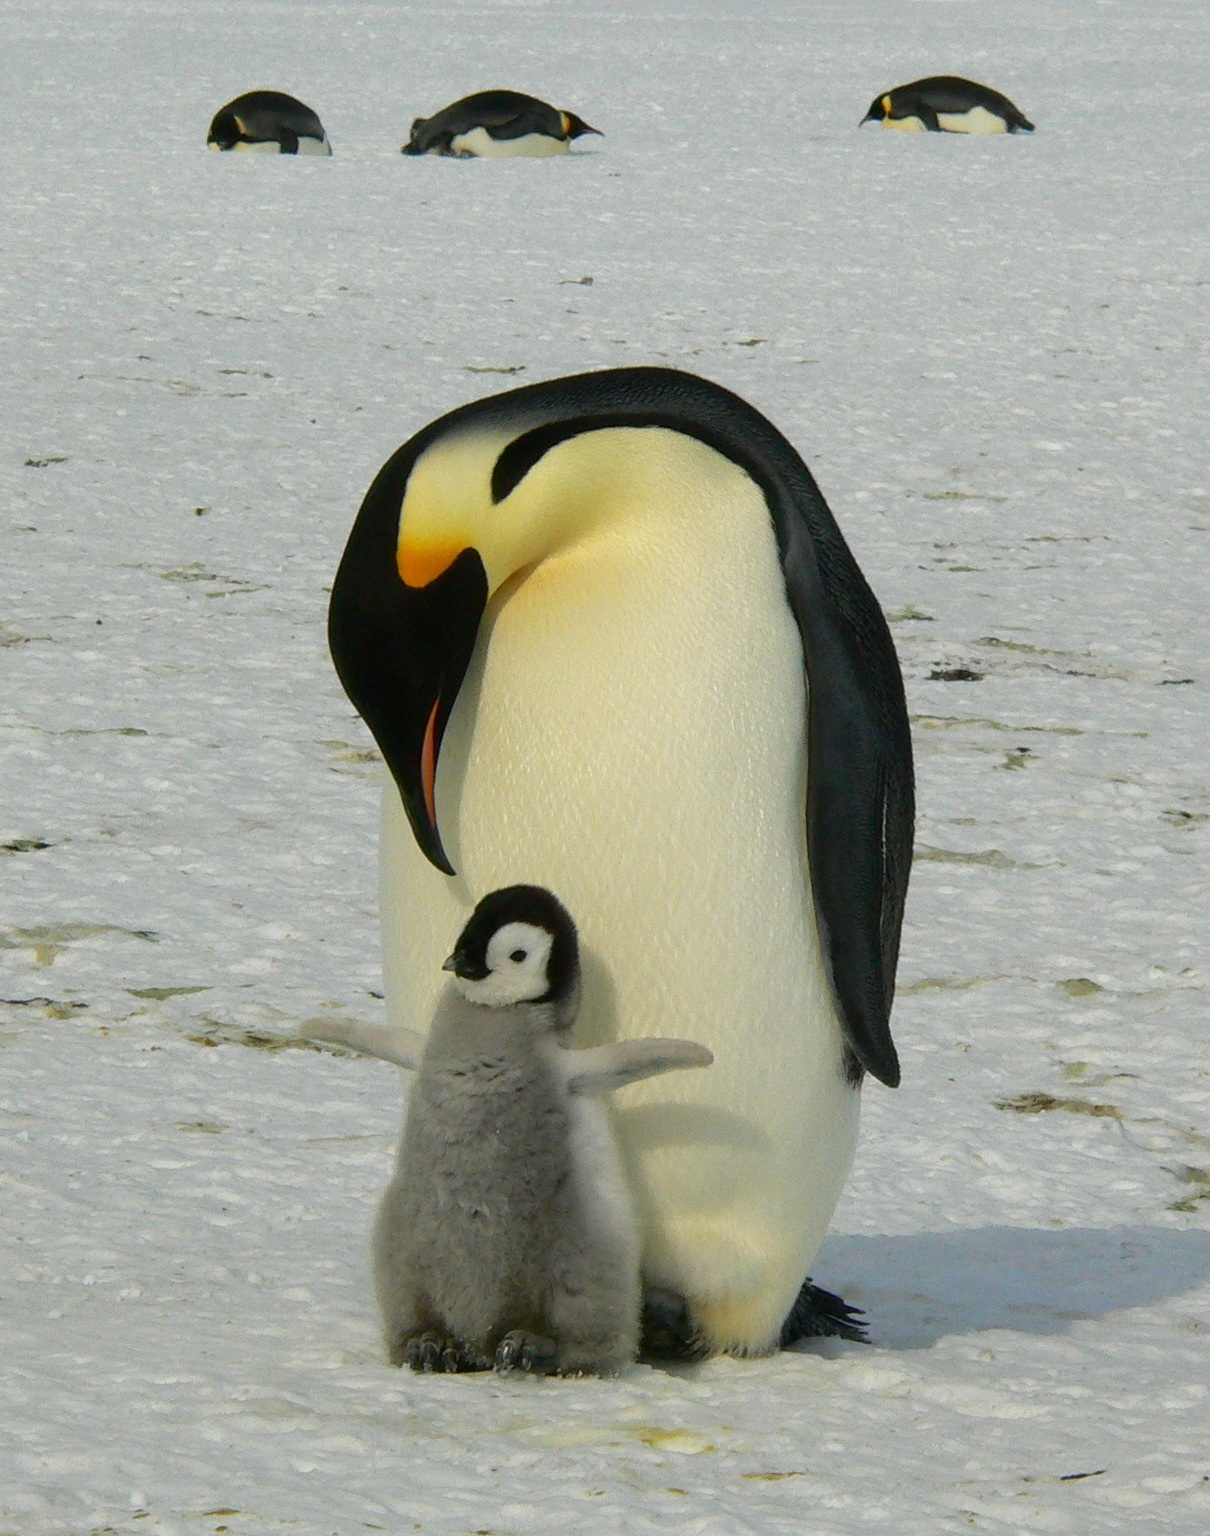 Emperor penguin fathers love.